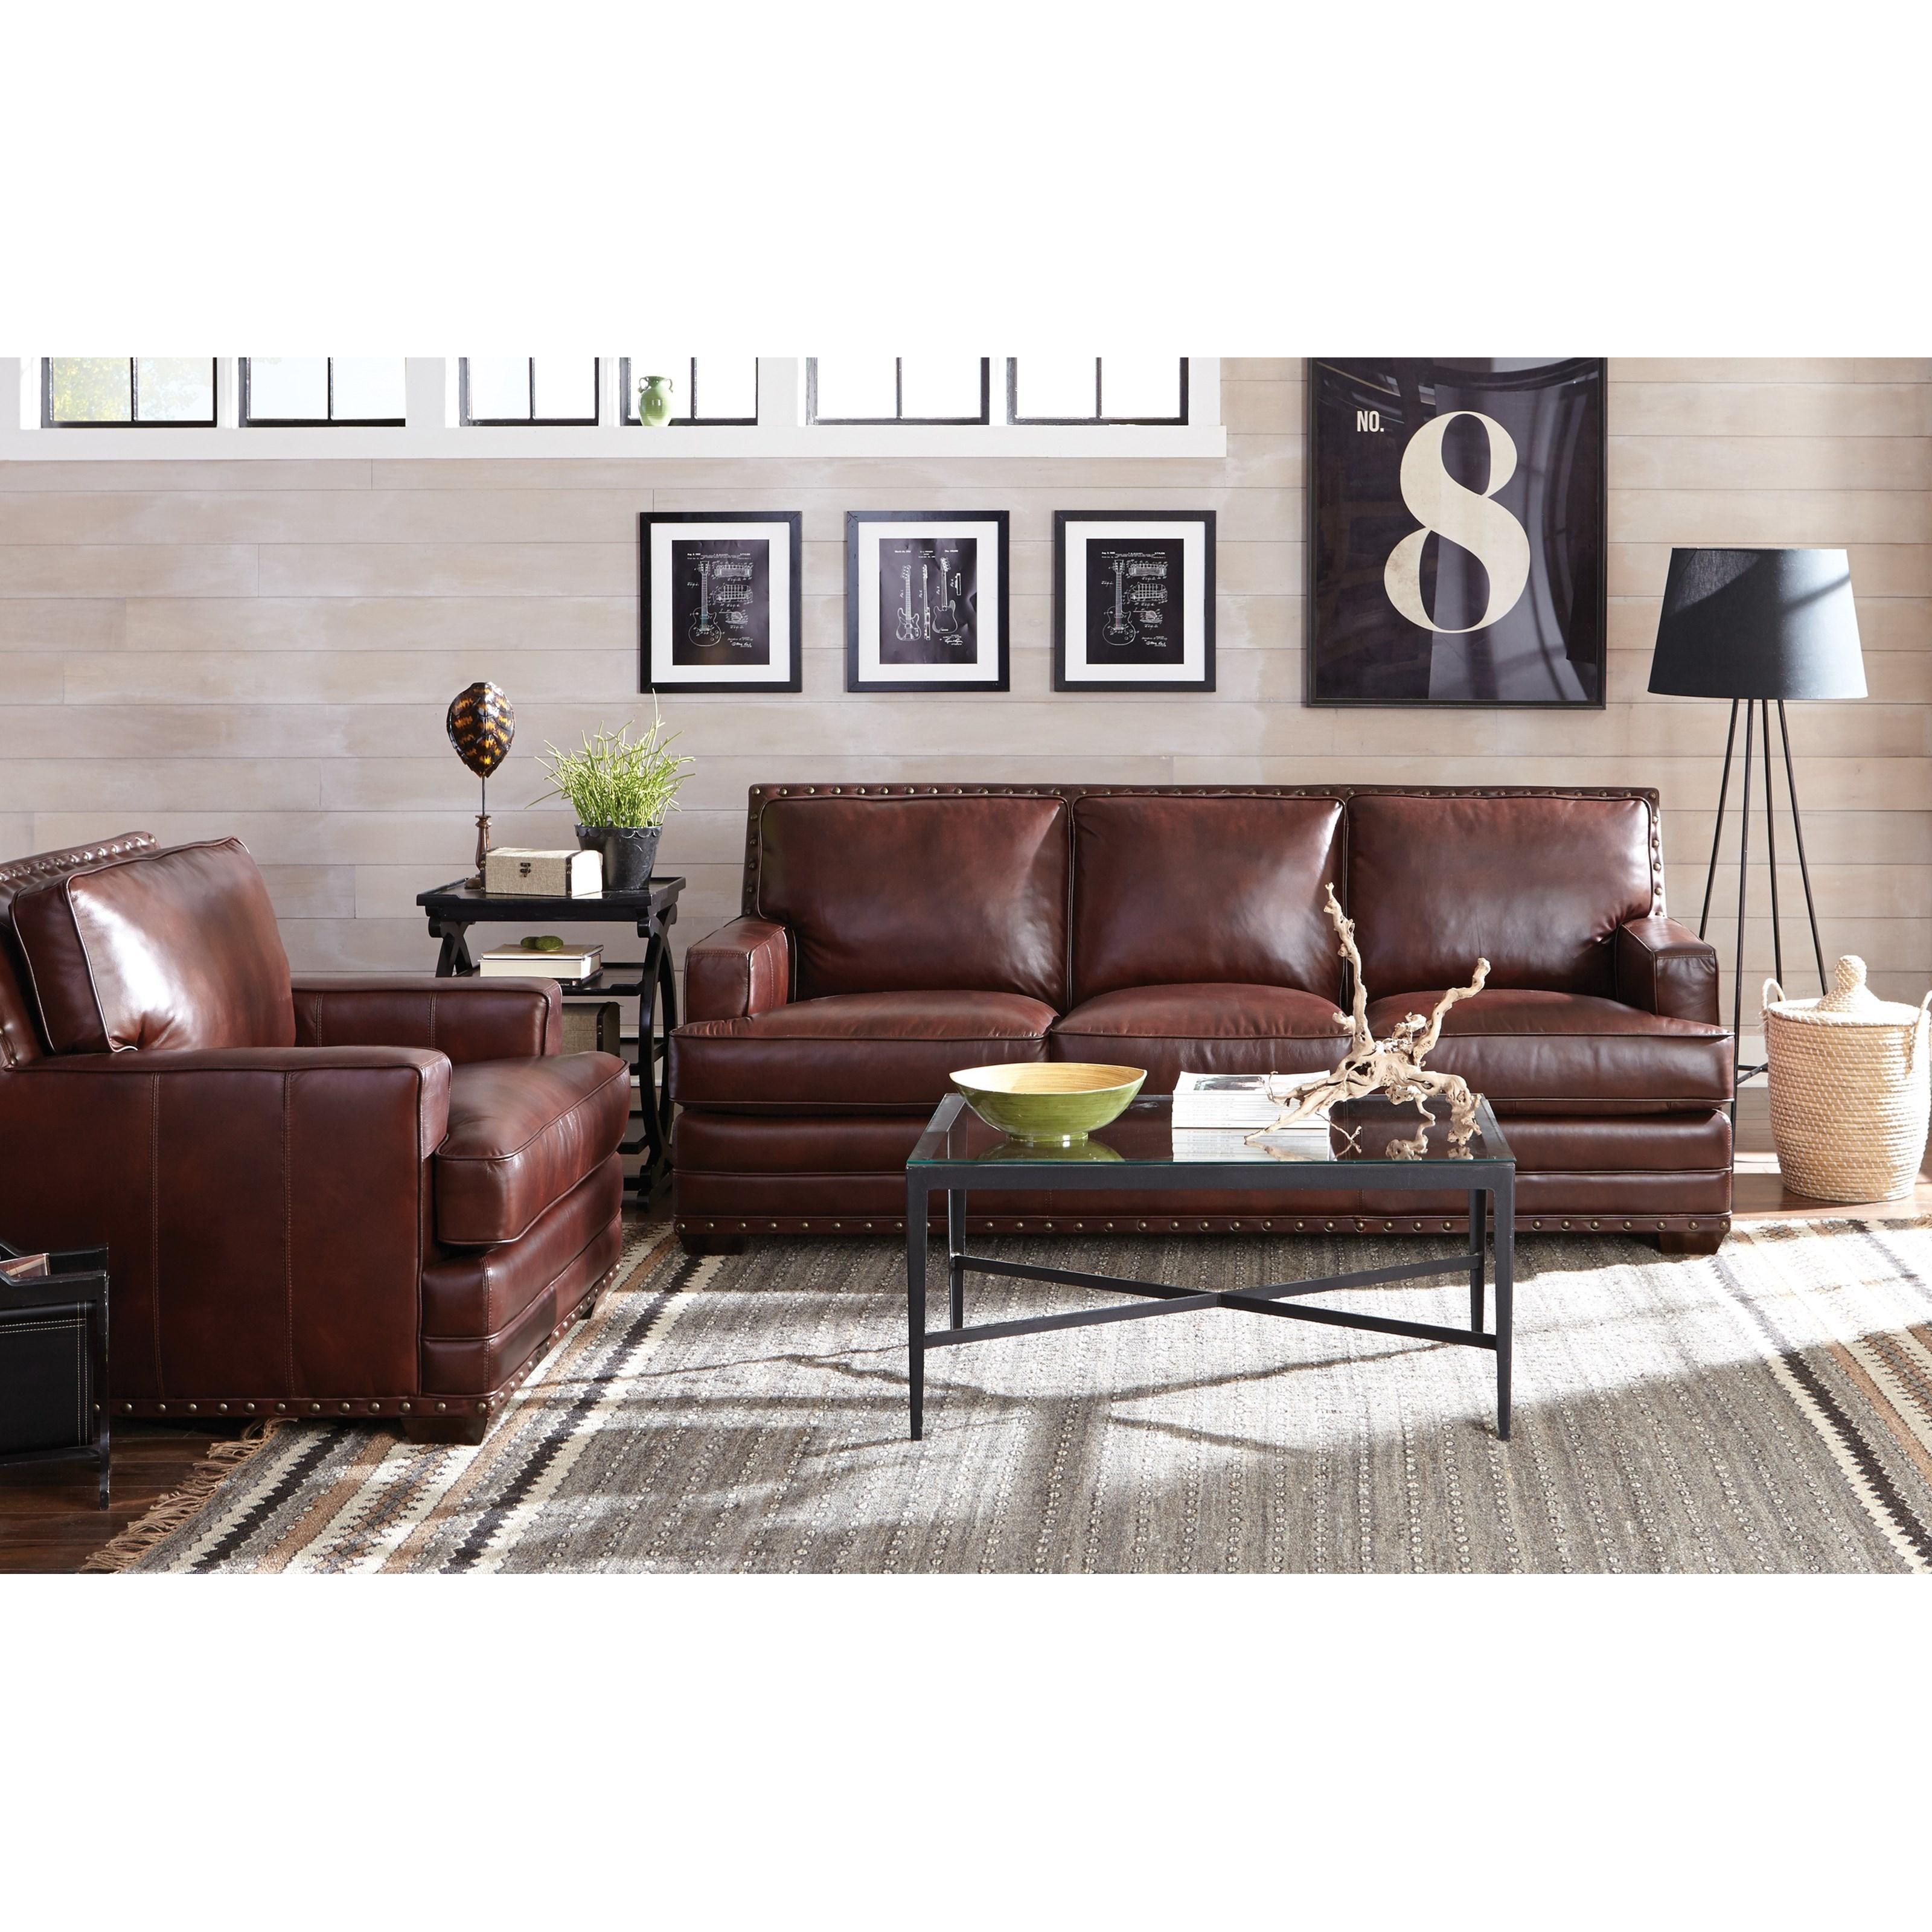 Craftmaster L1652 Transitional Sofa With Nailhead Trimming Belfort Furniture Sofa